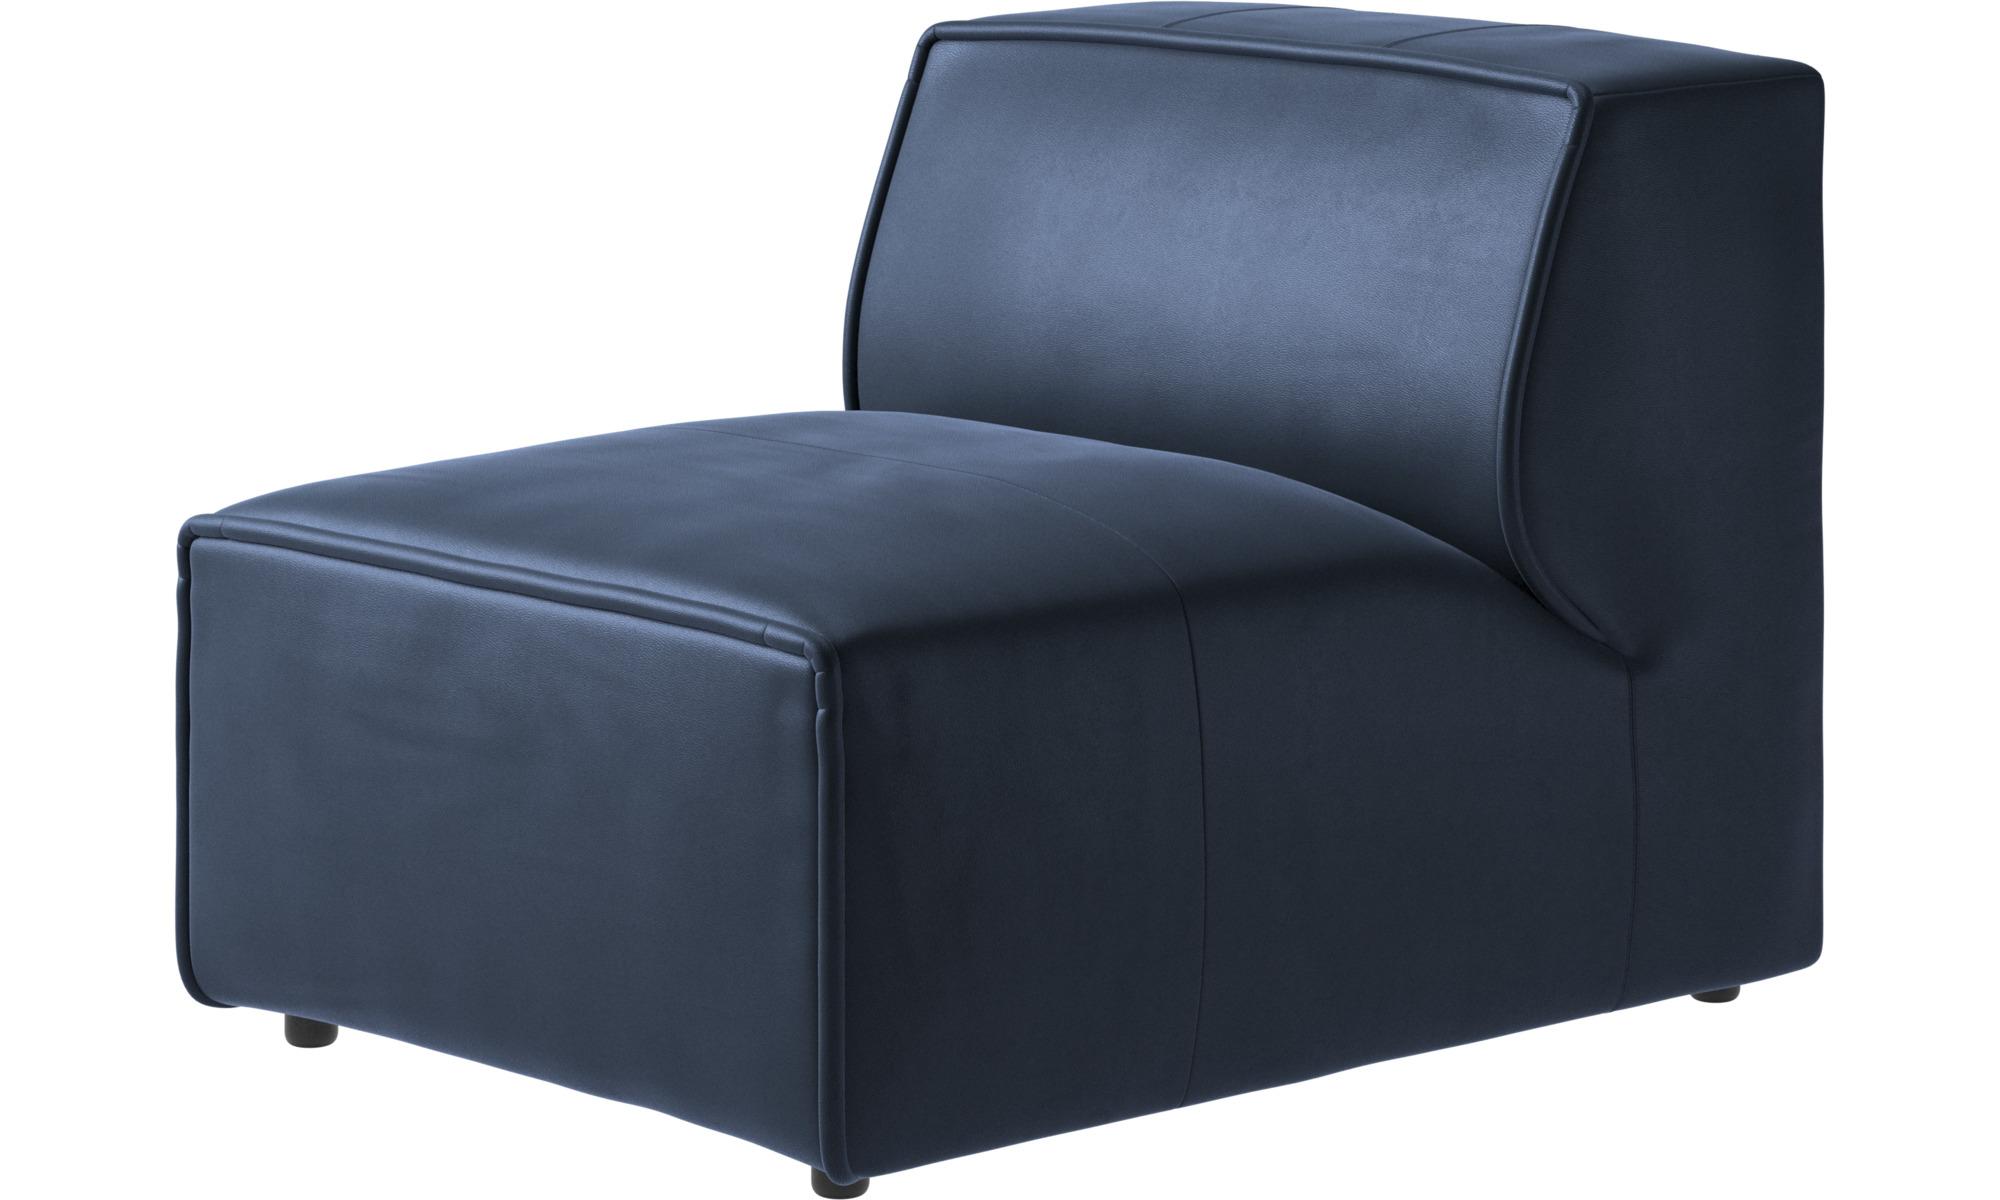 Armchairs - Carmo chair/basic unit - Blue - Leather